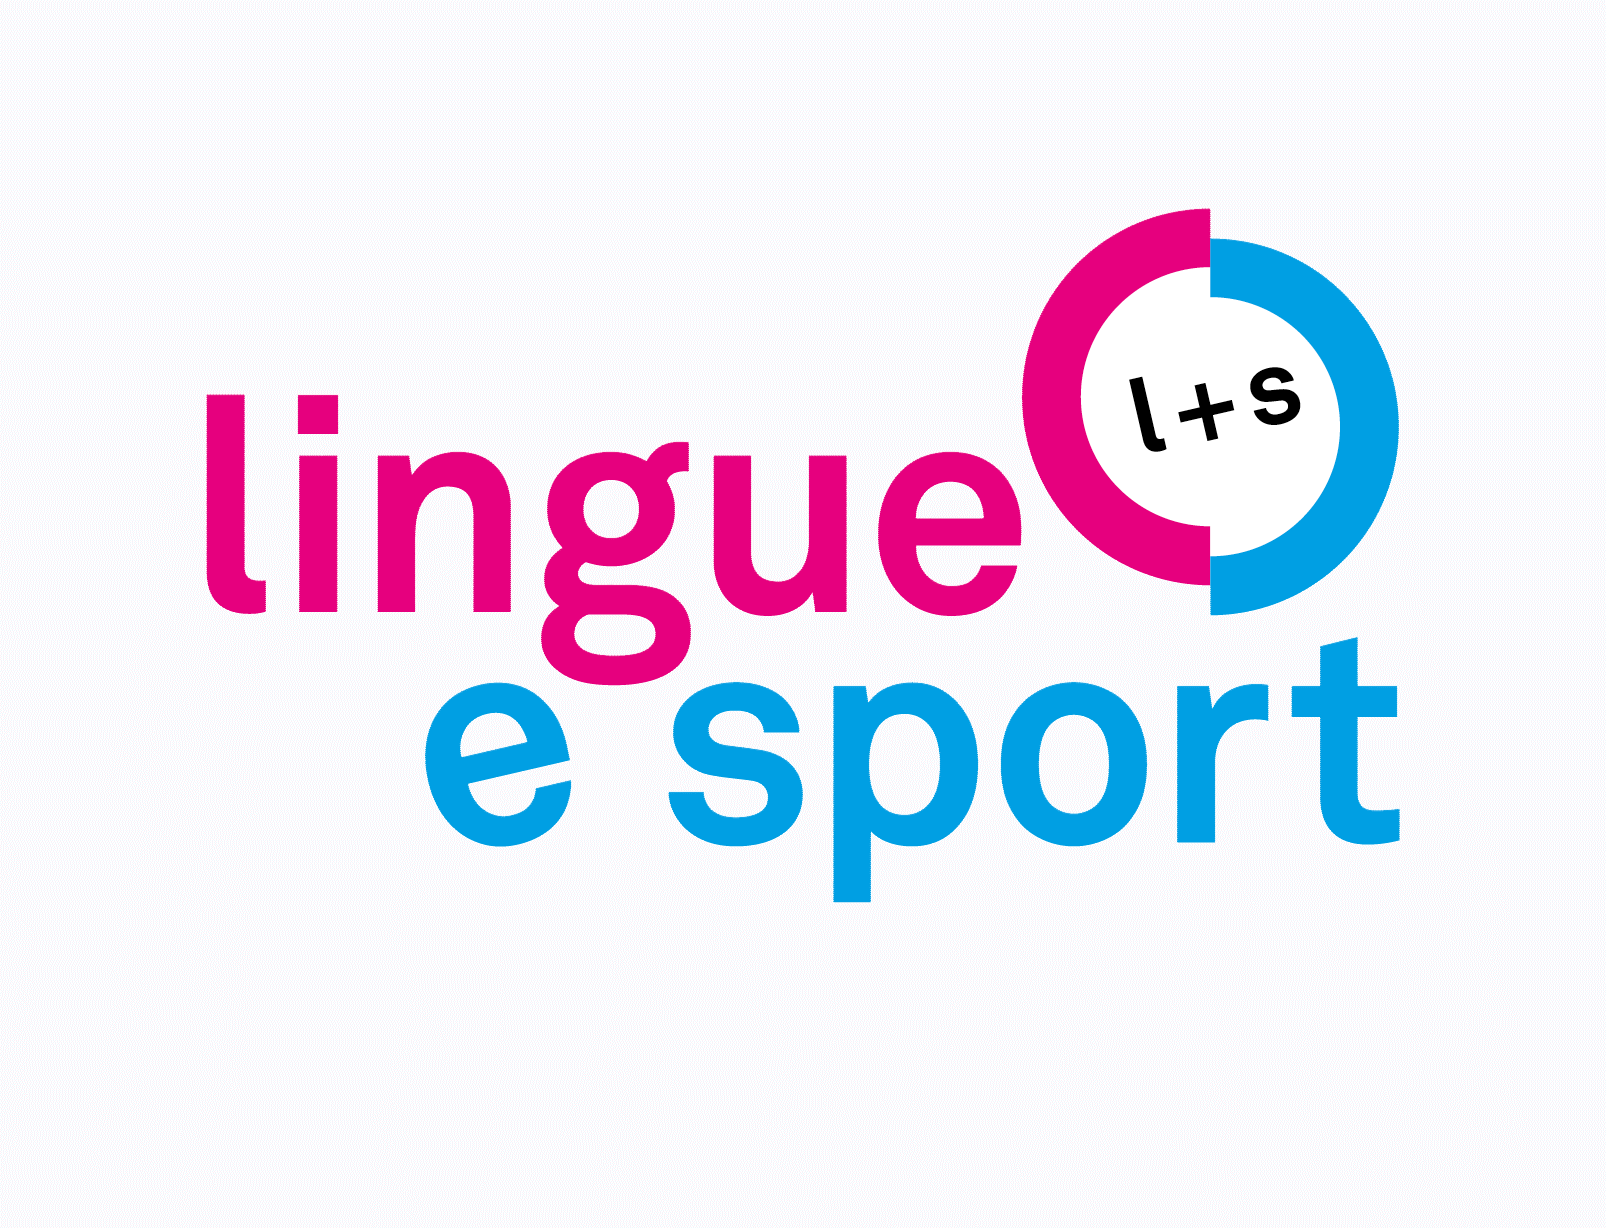 Lingue e Sport - Bellinzona 1